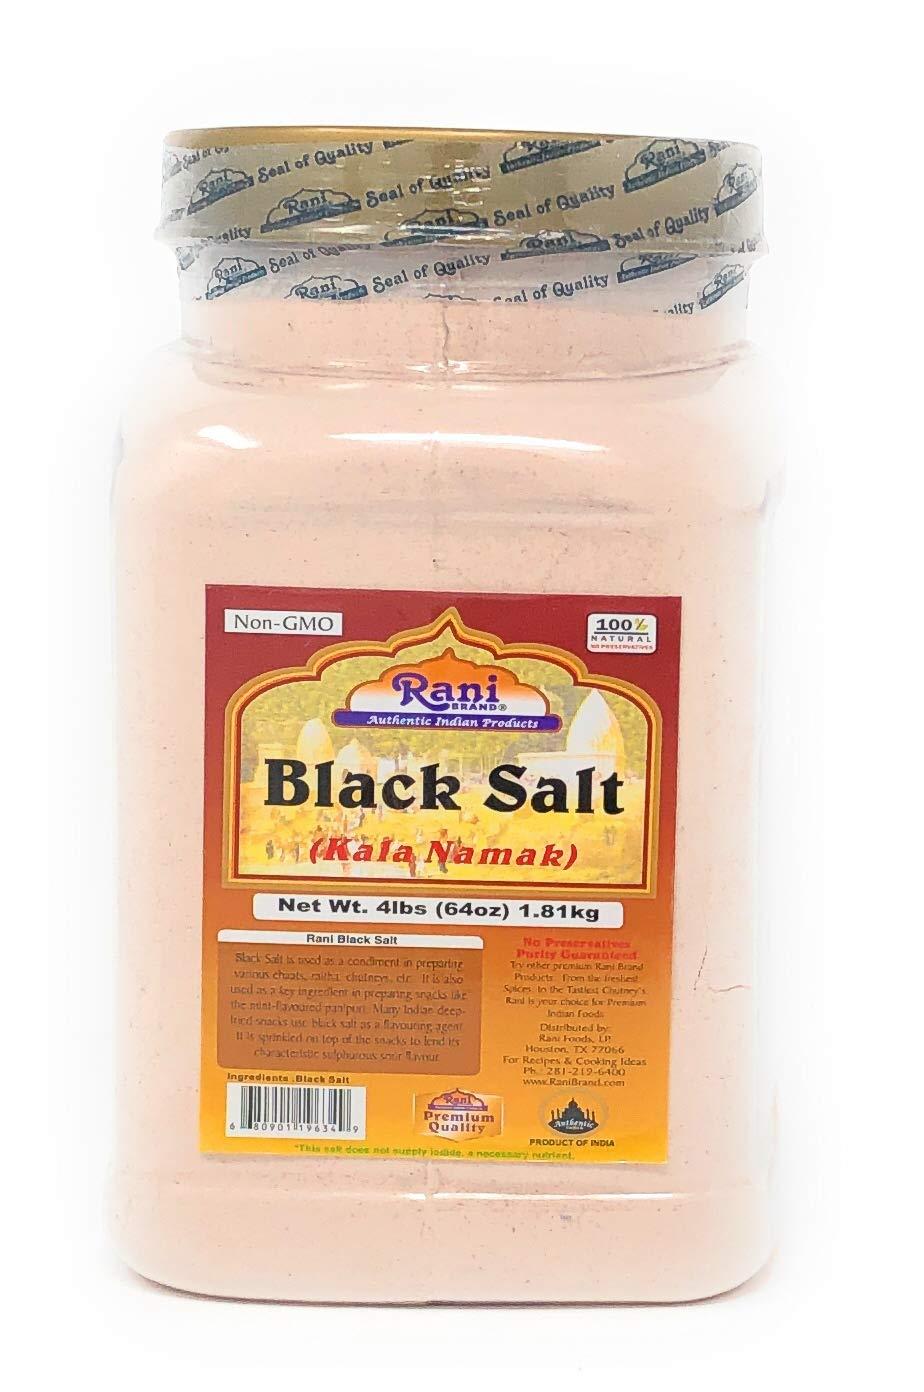 Rani Black Salt (Kala Namak Mineral) Powder, Vegan 4lb (64oz) ~ Bulk, Unrefined, Pure and Natural | Gluten Free Ingredients | NON-GMO | Indian Origin | Perfect for Tofu Scramble - Natural Egg Taste